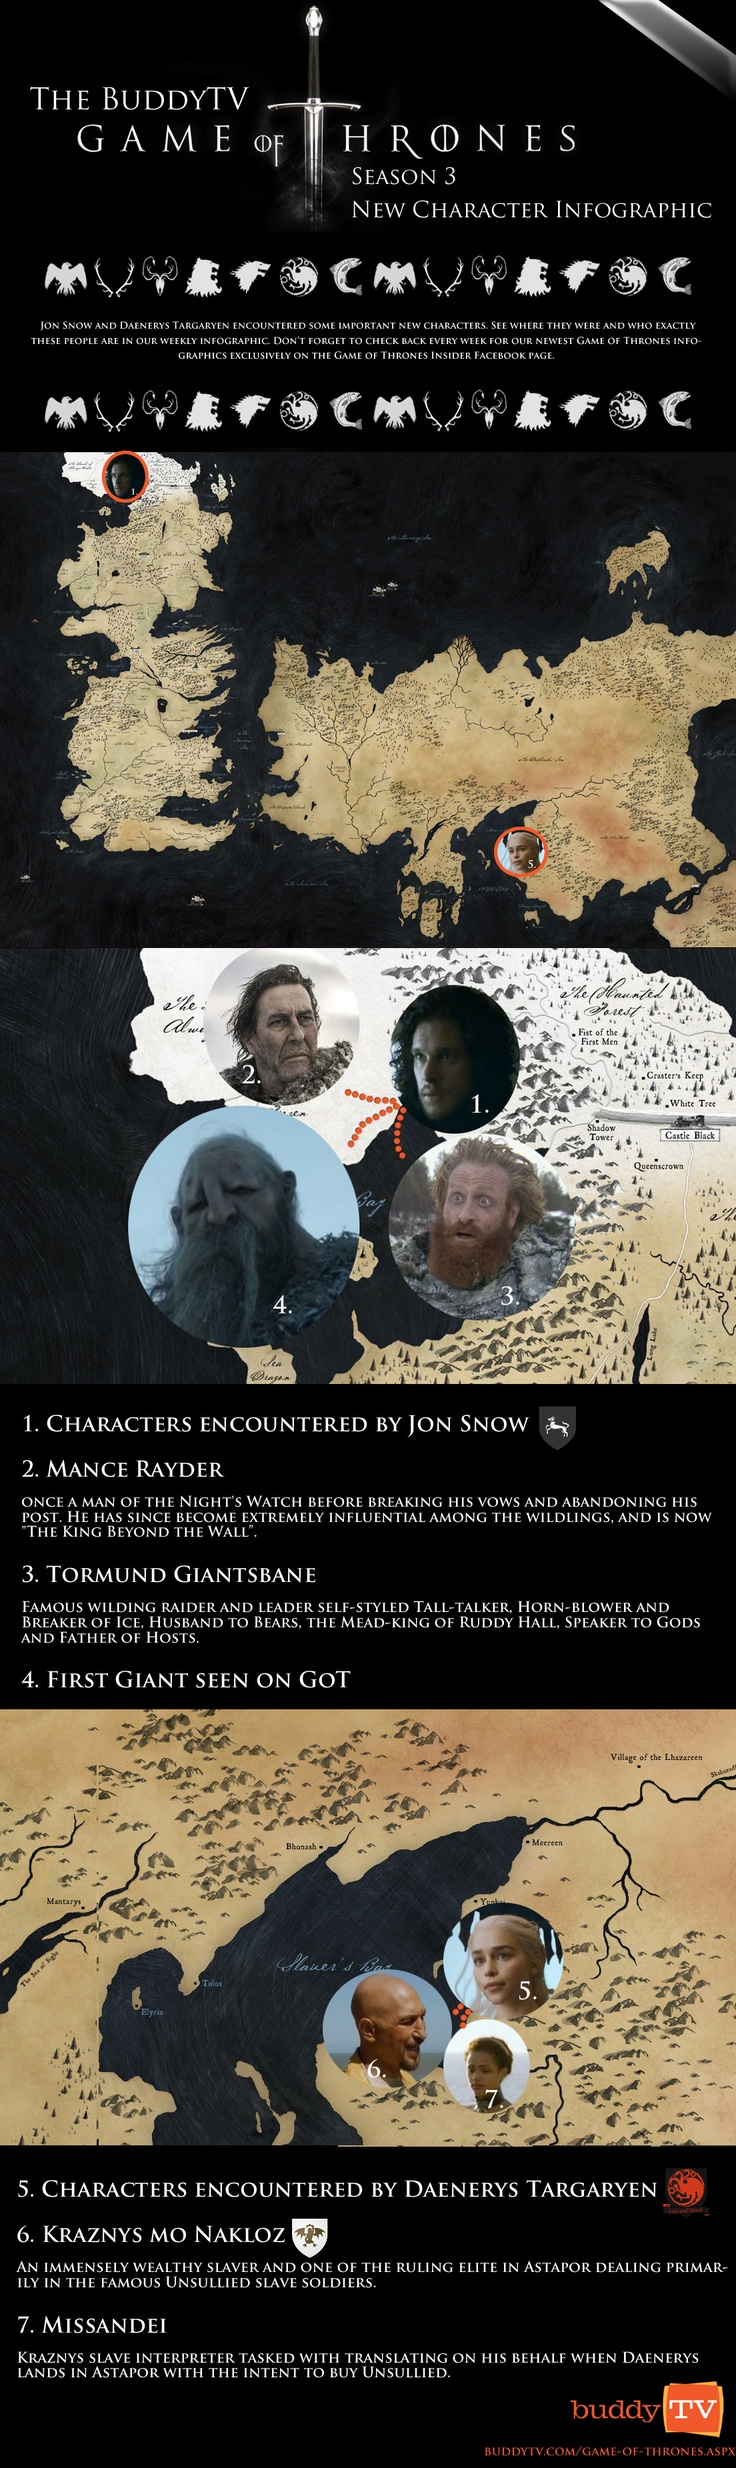 guardian game of thrones season 2 episode 4